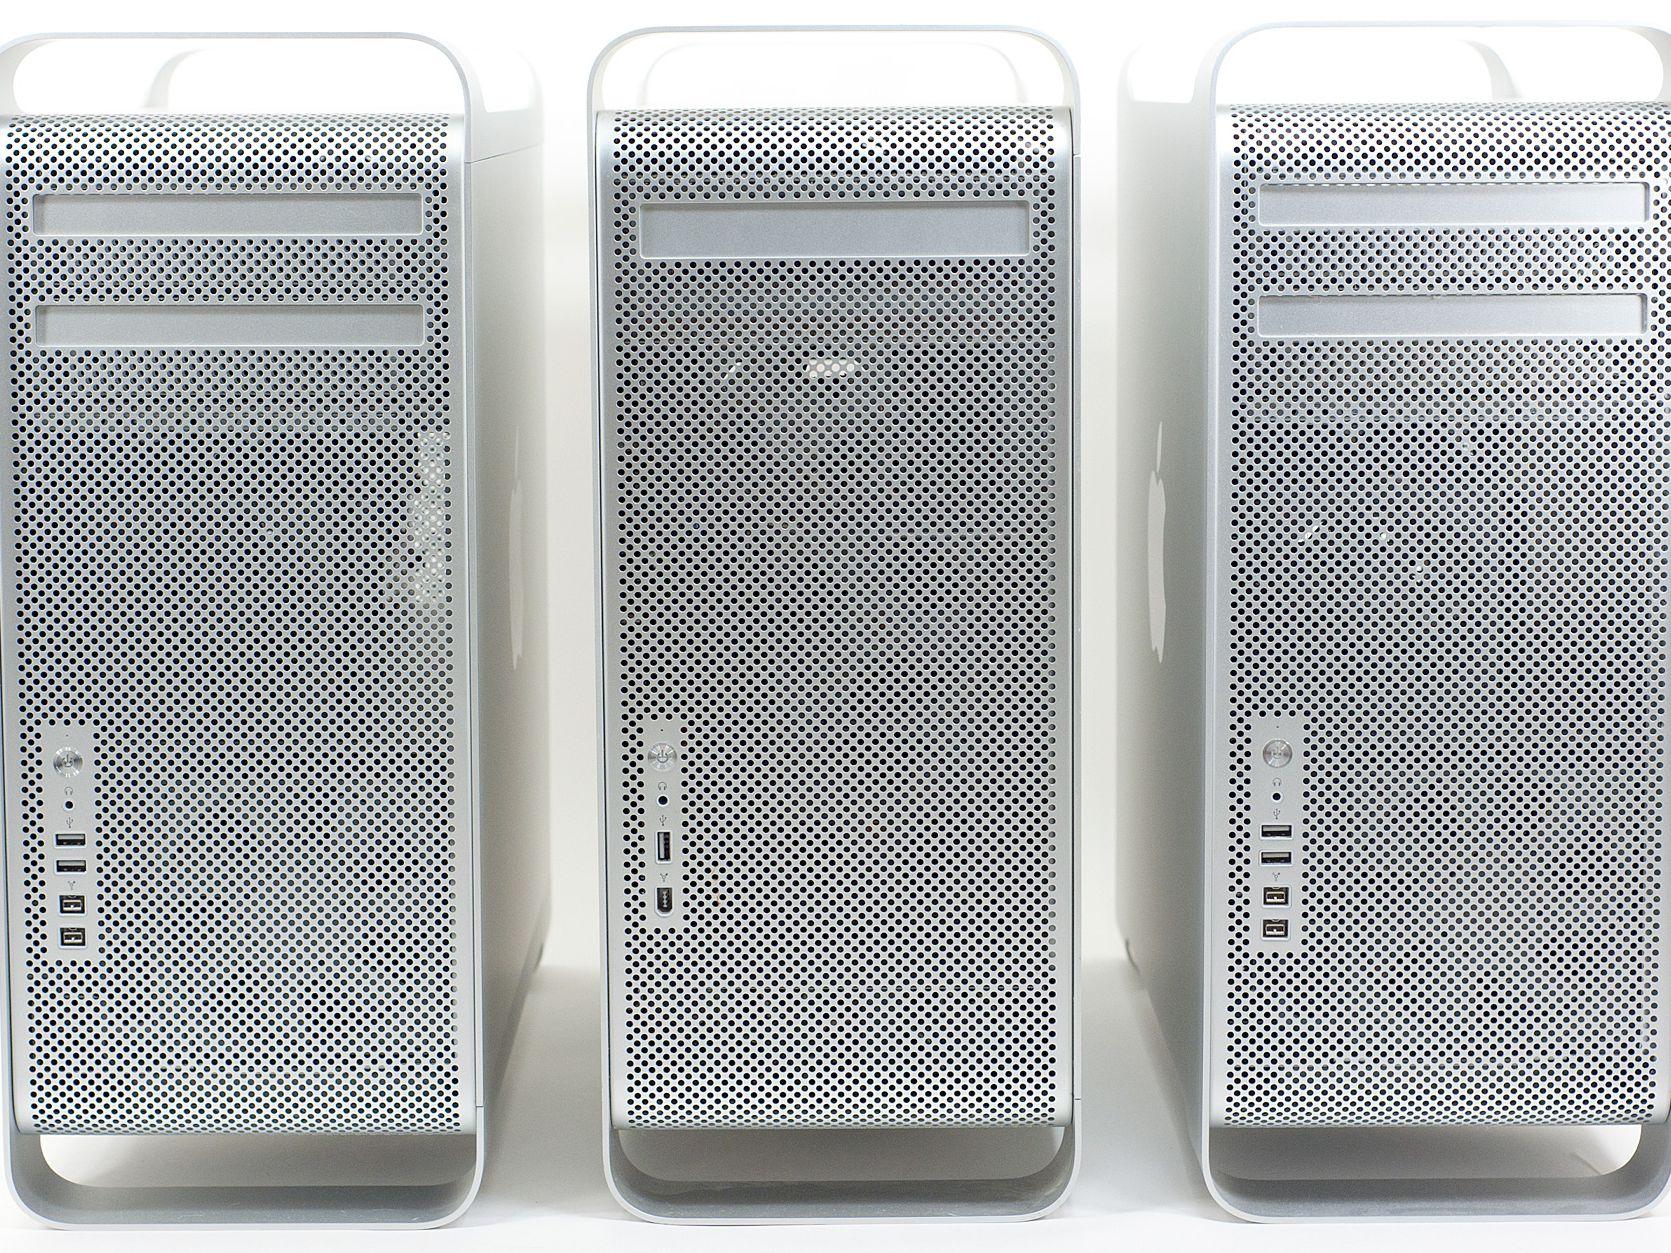 32GB 4 X 8GB PC3-10600 1333 MHZ ECC REG APPLE Mac Pro 4,1 2009 5,1 2010 /& 2012